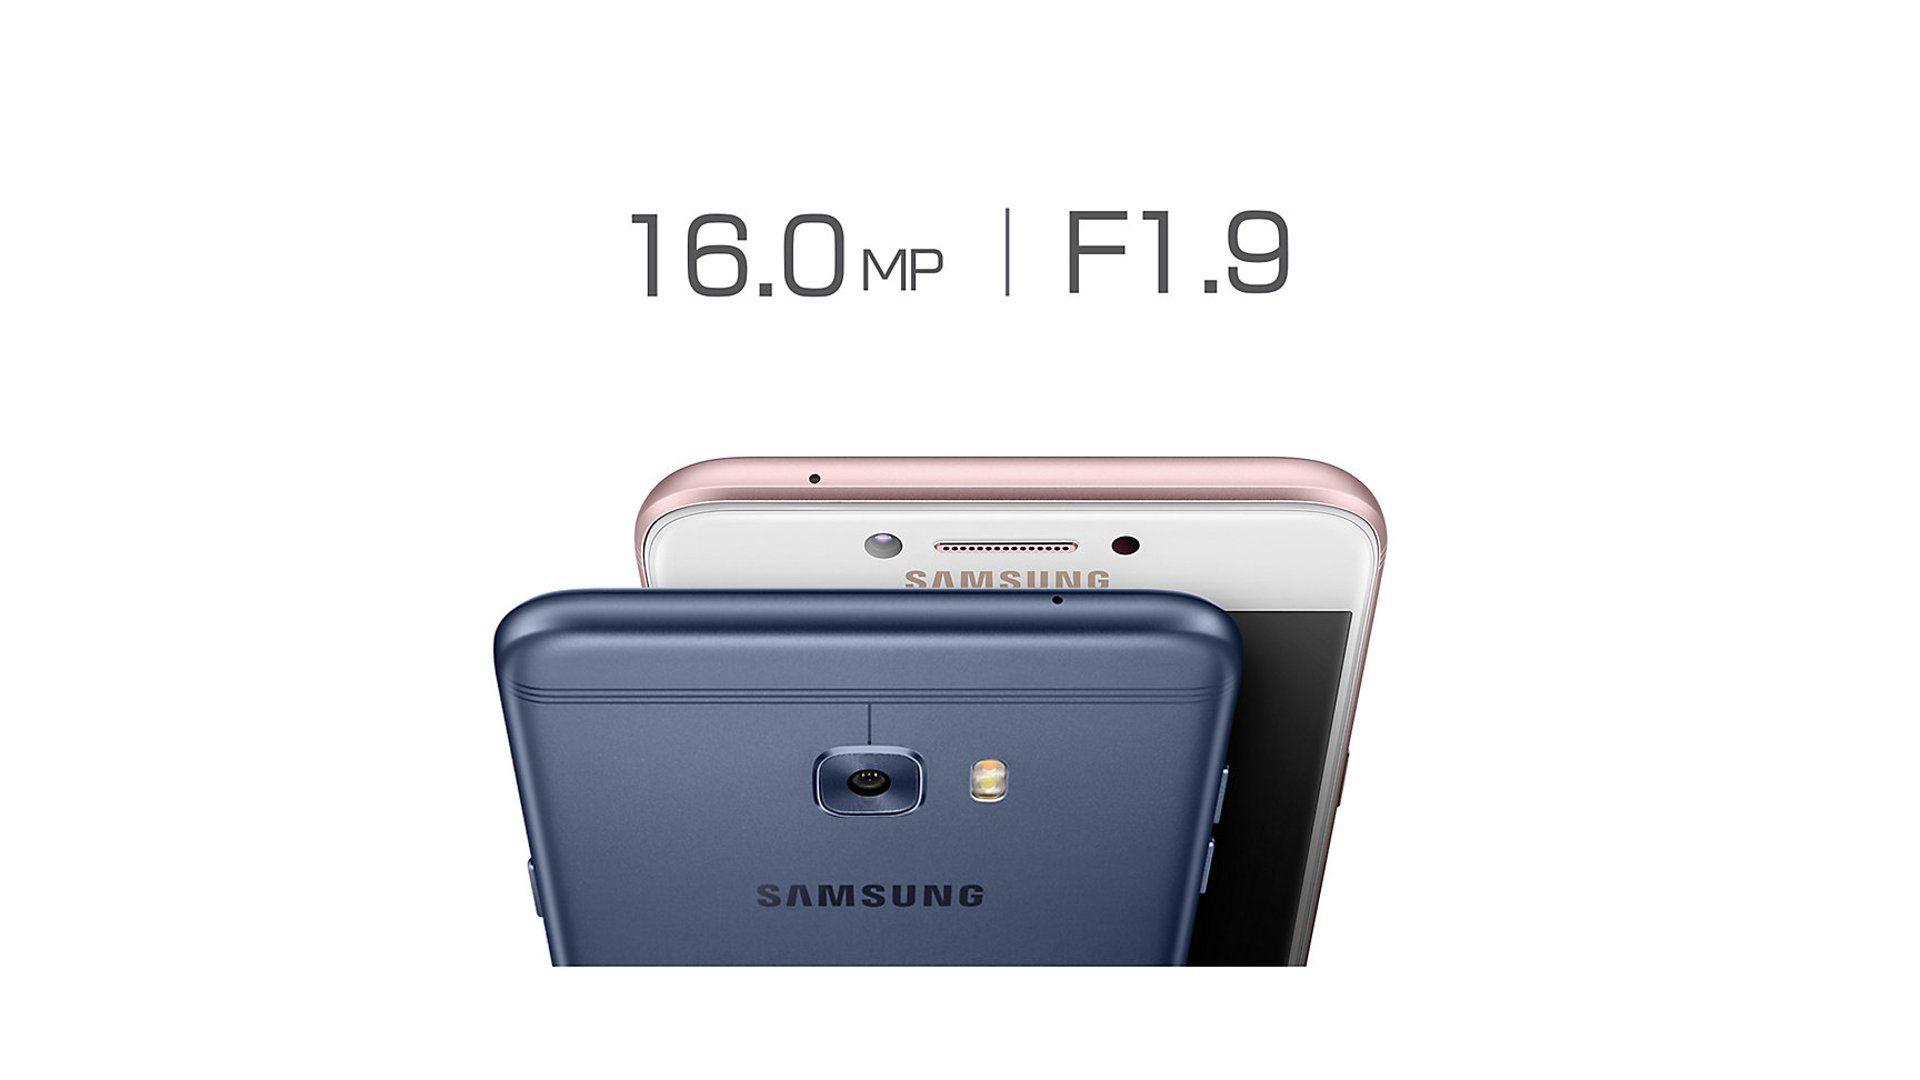 Samsung Galaxy C7 Pro - Camera Info